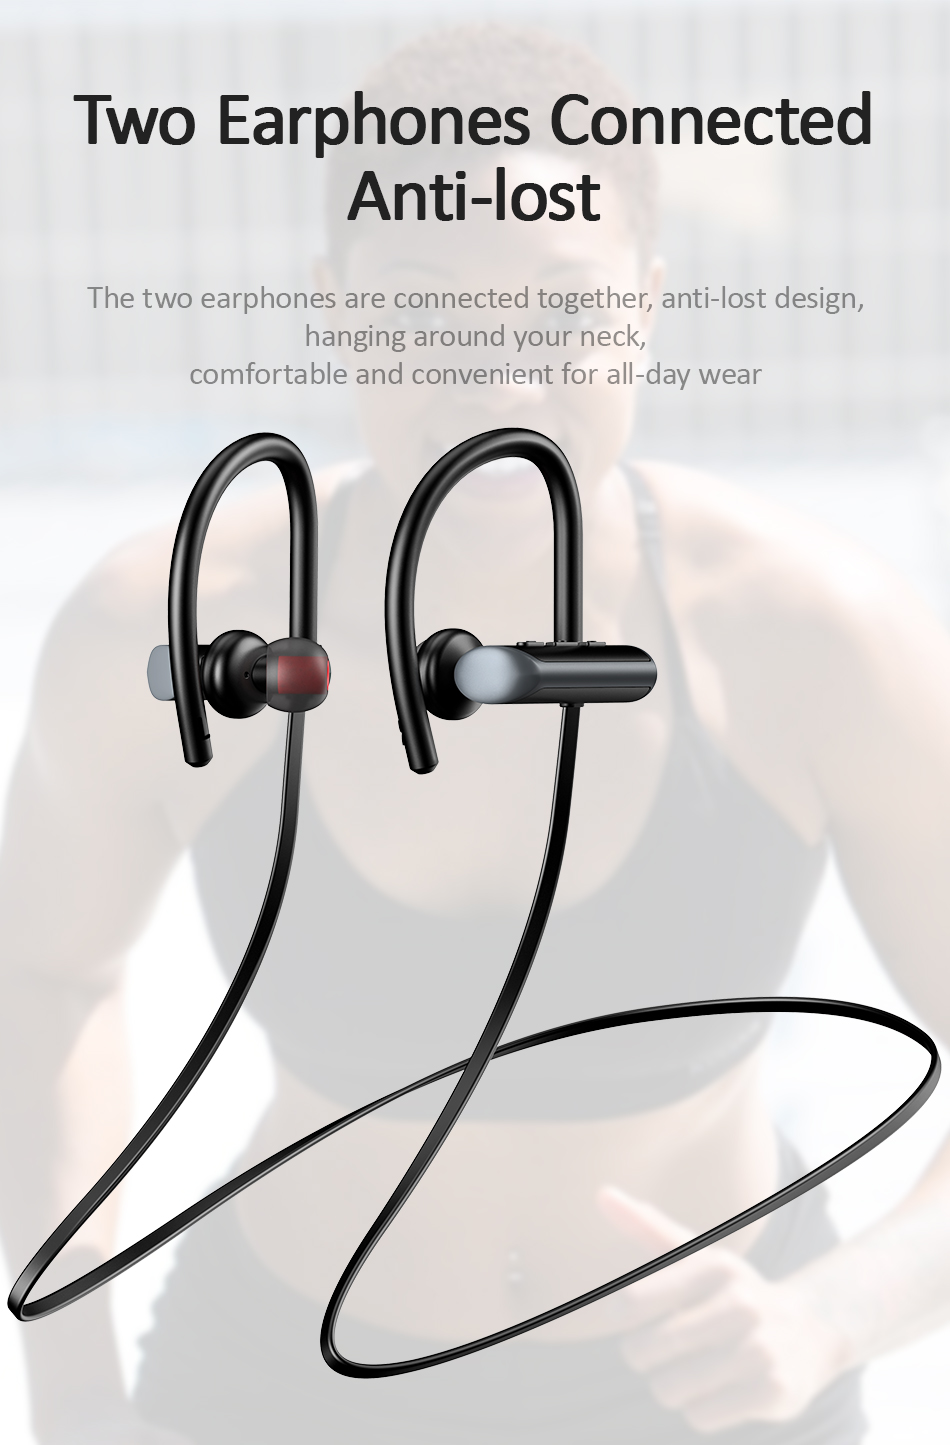 20201010-US-YD004-S4-Sport系列-蓝牙运动耳机-950px_11